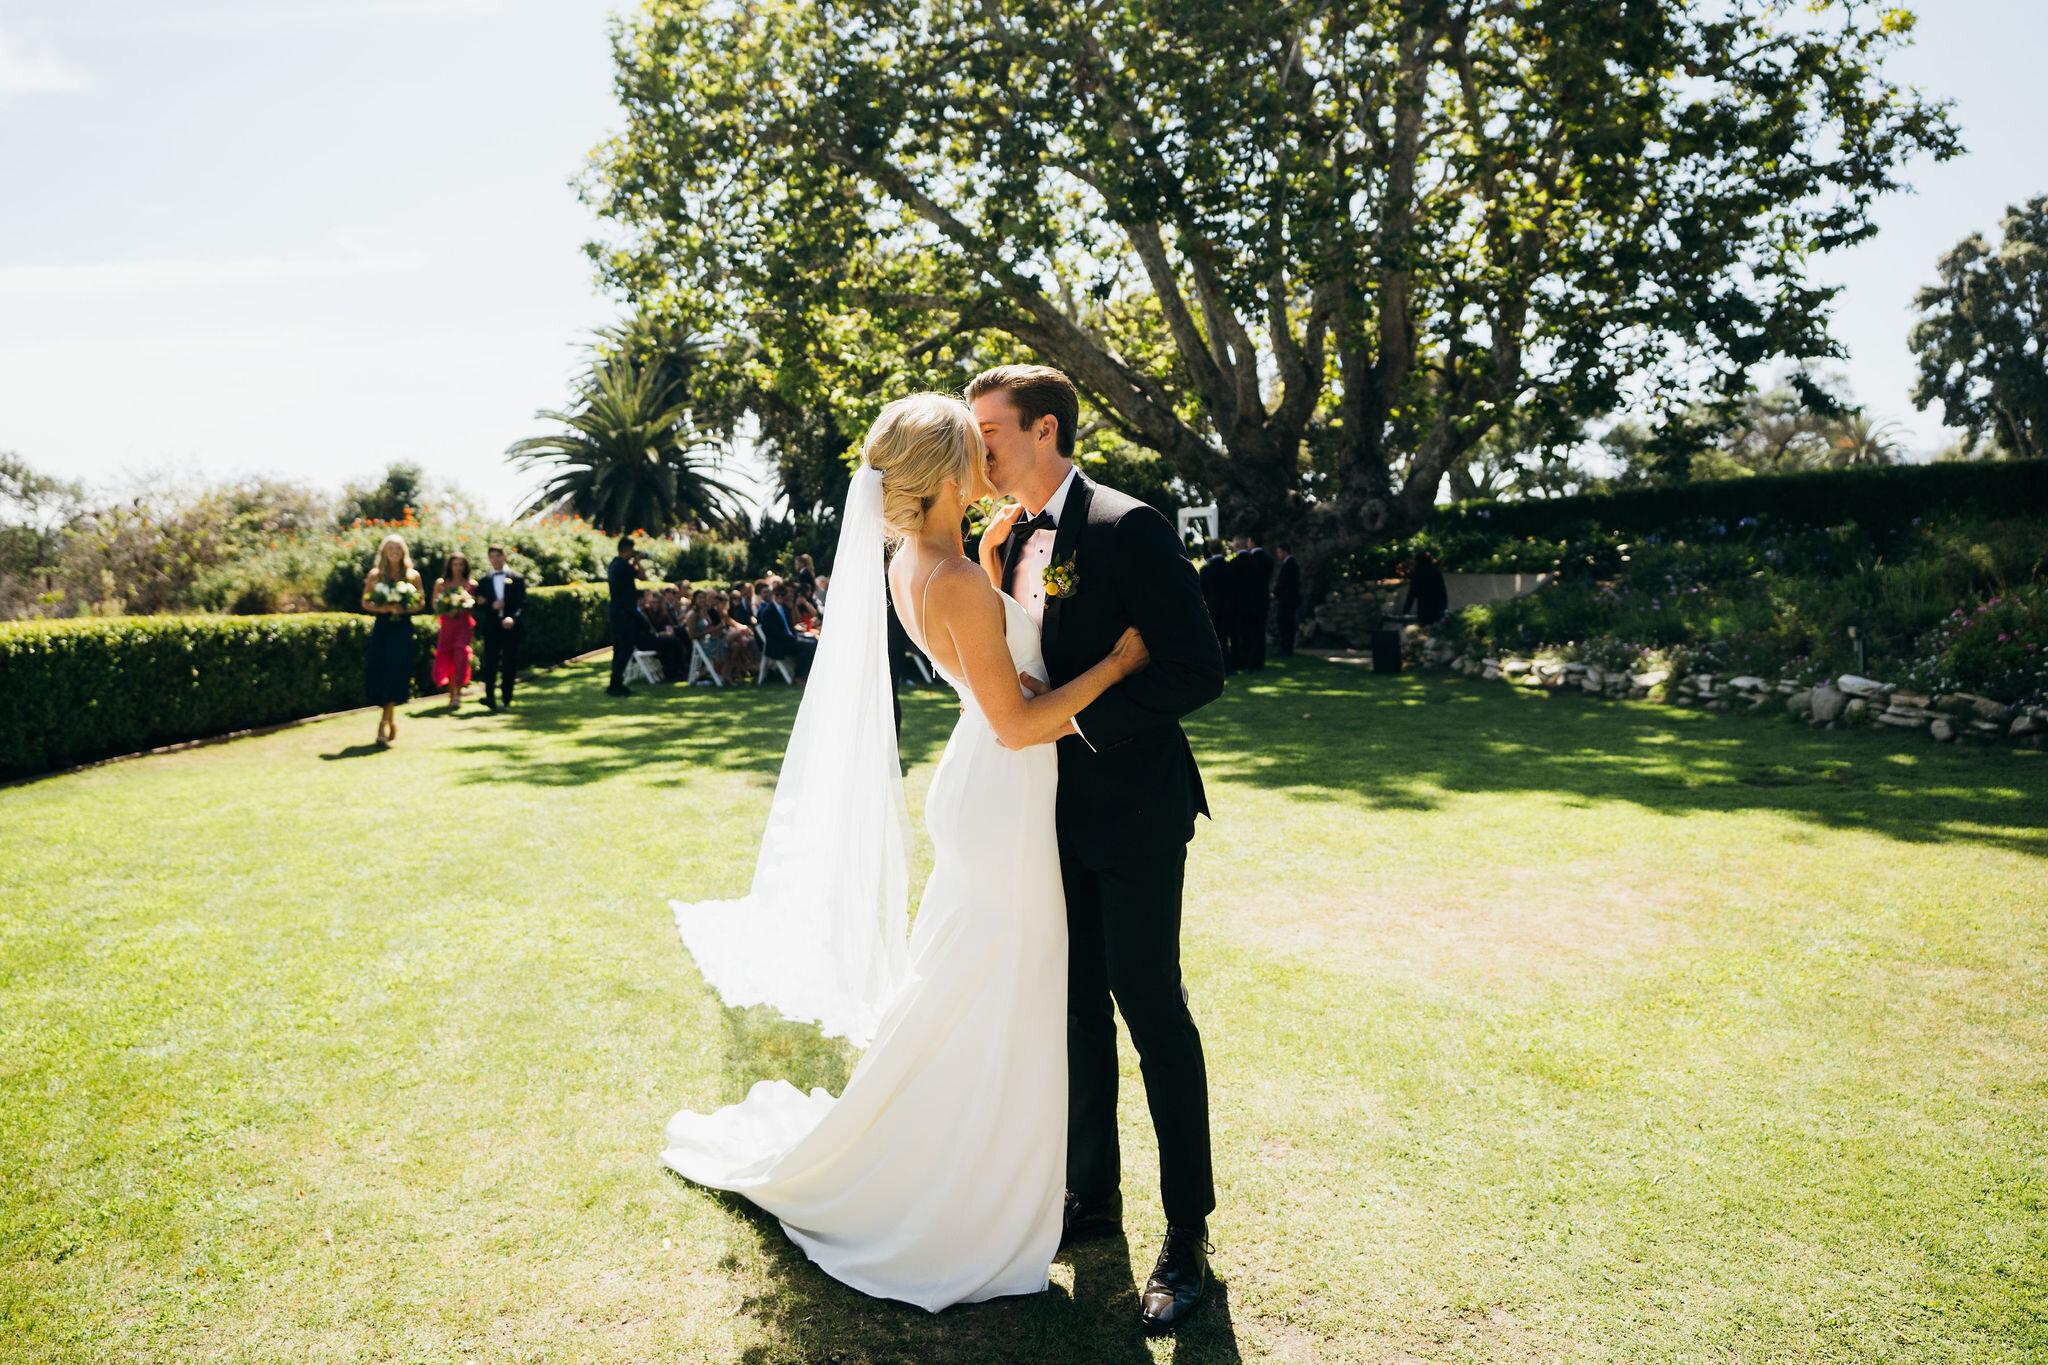 adamson-house-wedding-photography-086.jpg